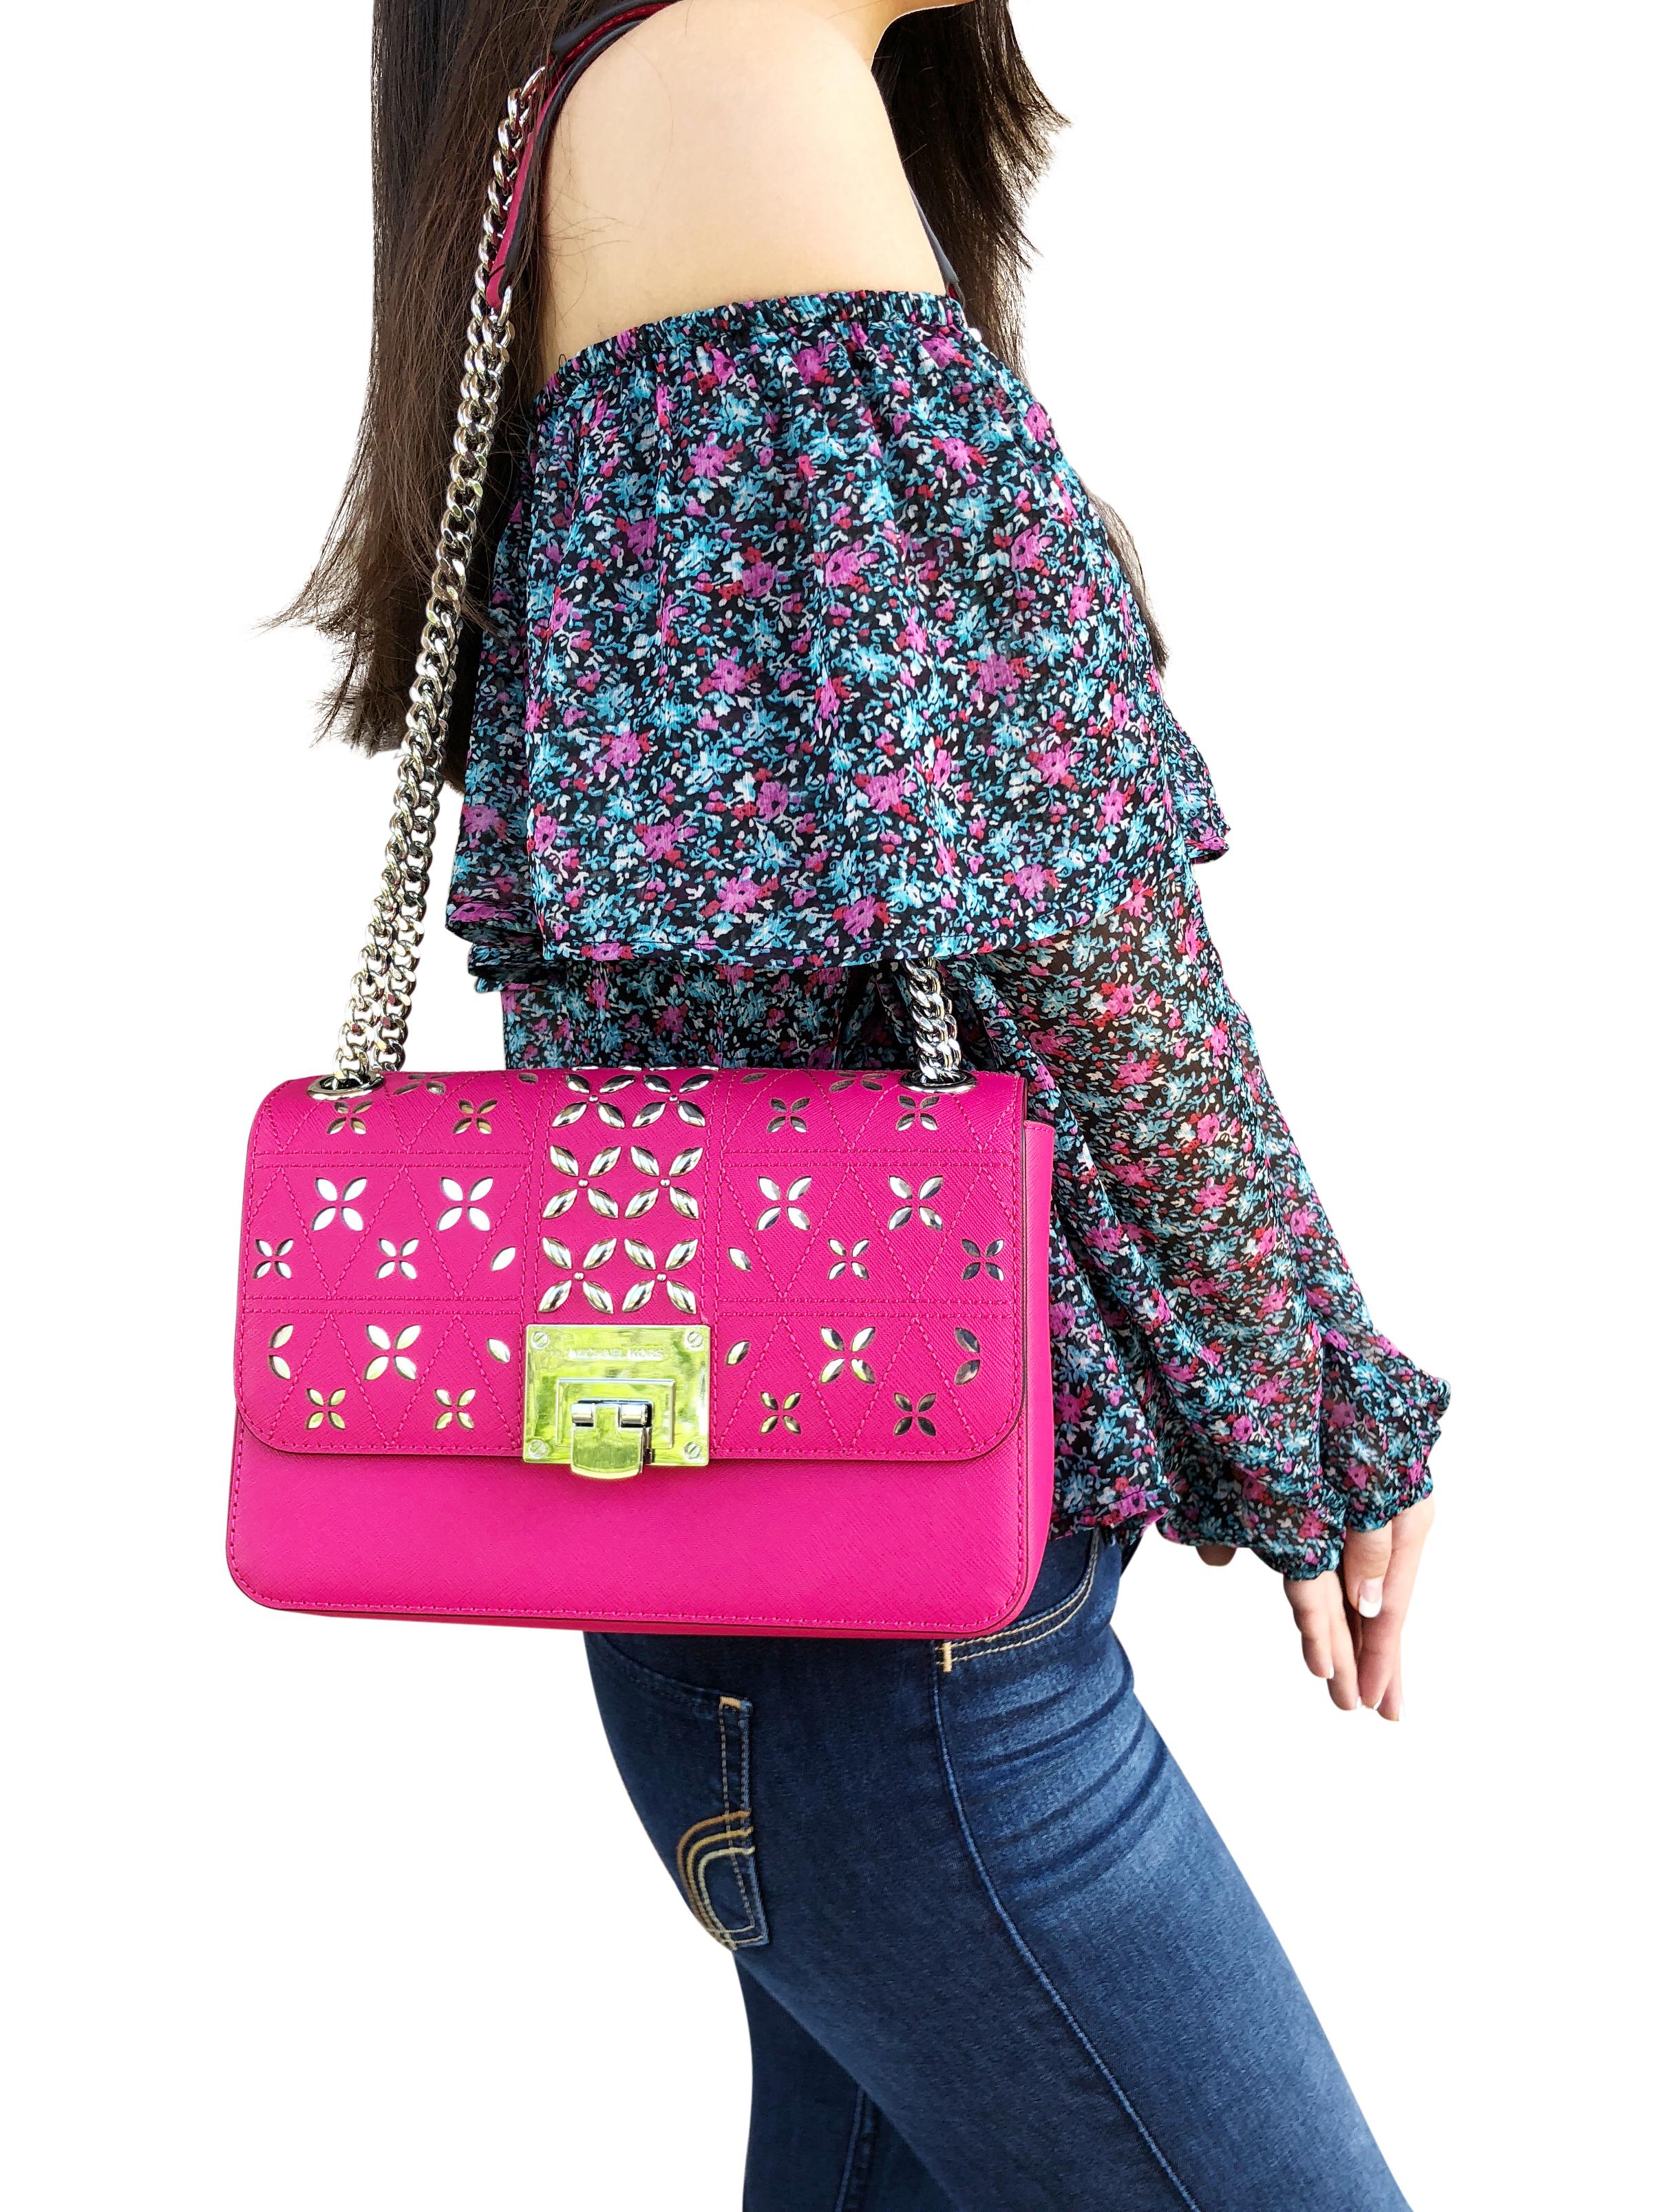 2cd8053ee3ed5d Michael Kors Tina Studded Medium Shoulder Flap Bag Crossody Ultra Pink  Lipstick